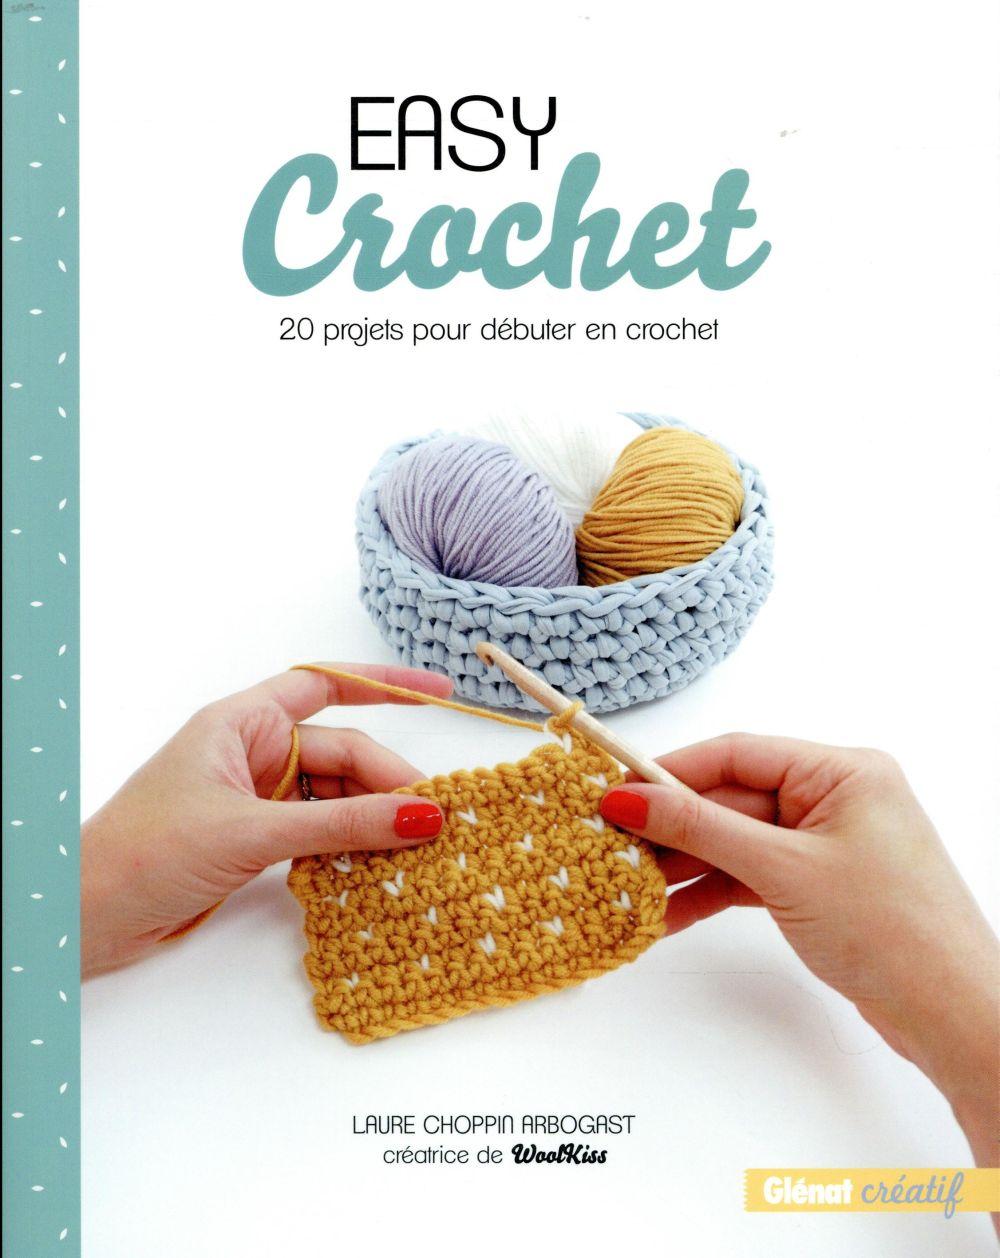 Easy crochet ; 20 projets pour débuter en crochet